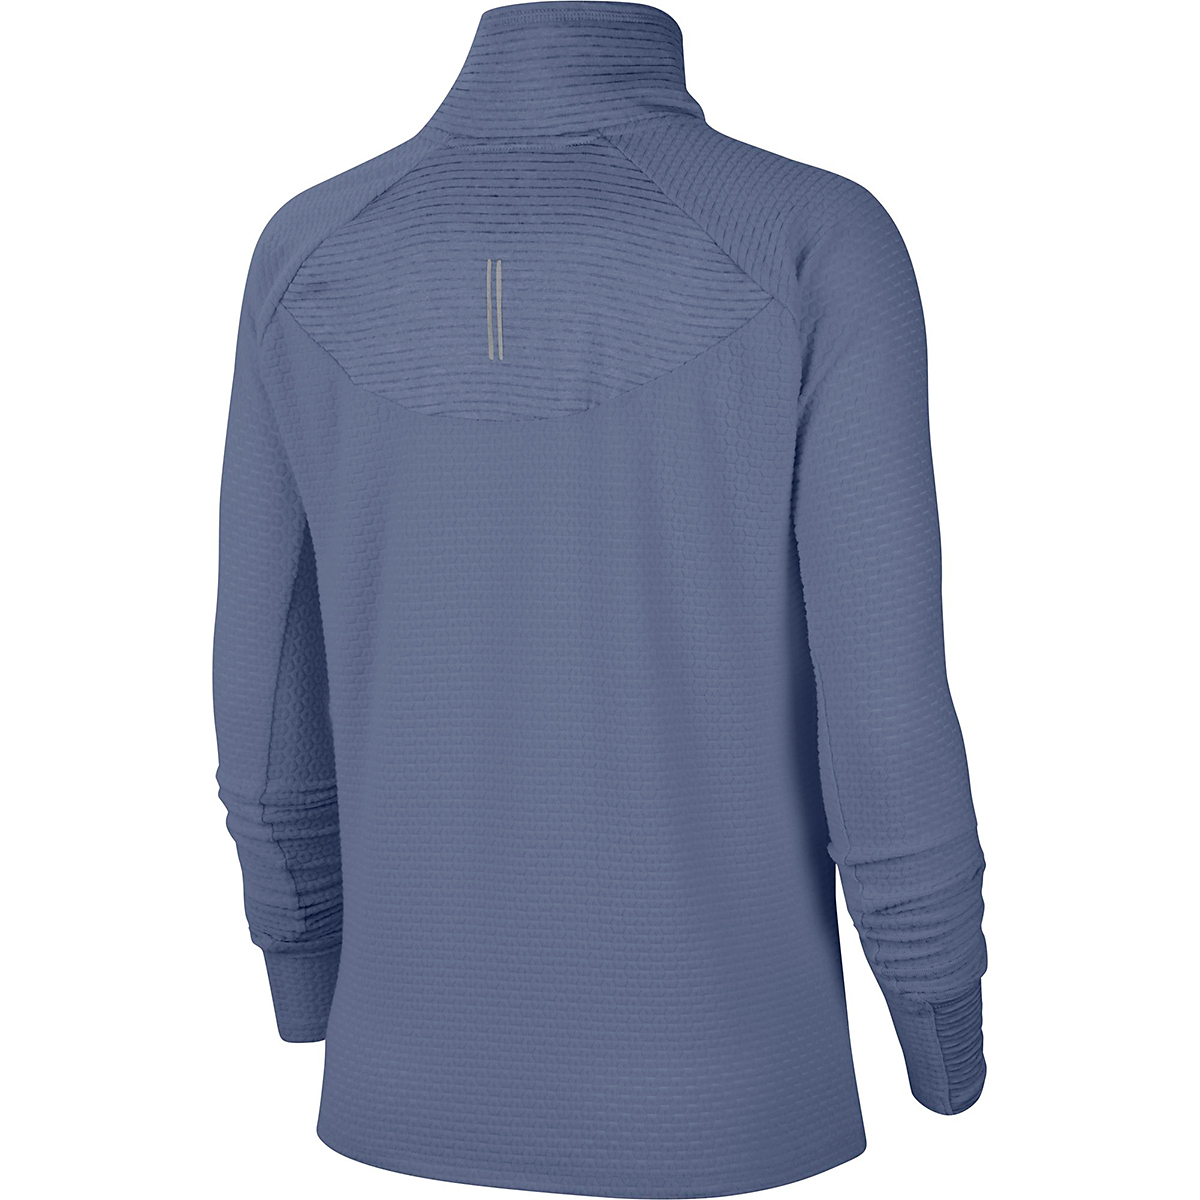 Women's Nike Sphere Half Zip Long Sleeve Shirt - Color: World Indigo/Reflective Silver - Size: XS, World Indigo/Reflective Silver, large, image 2